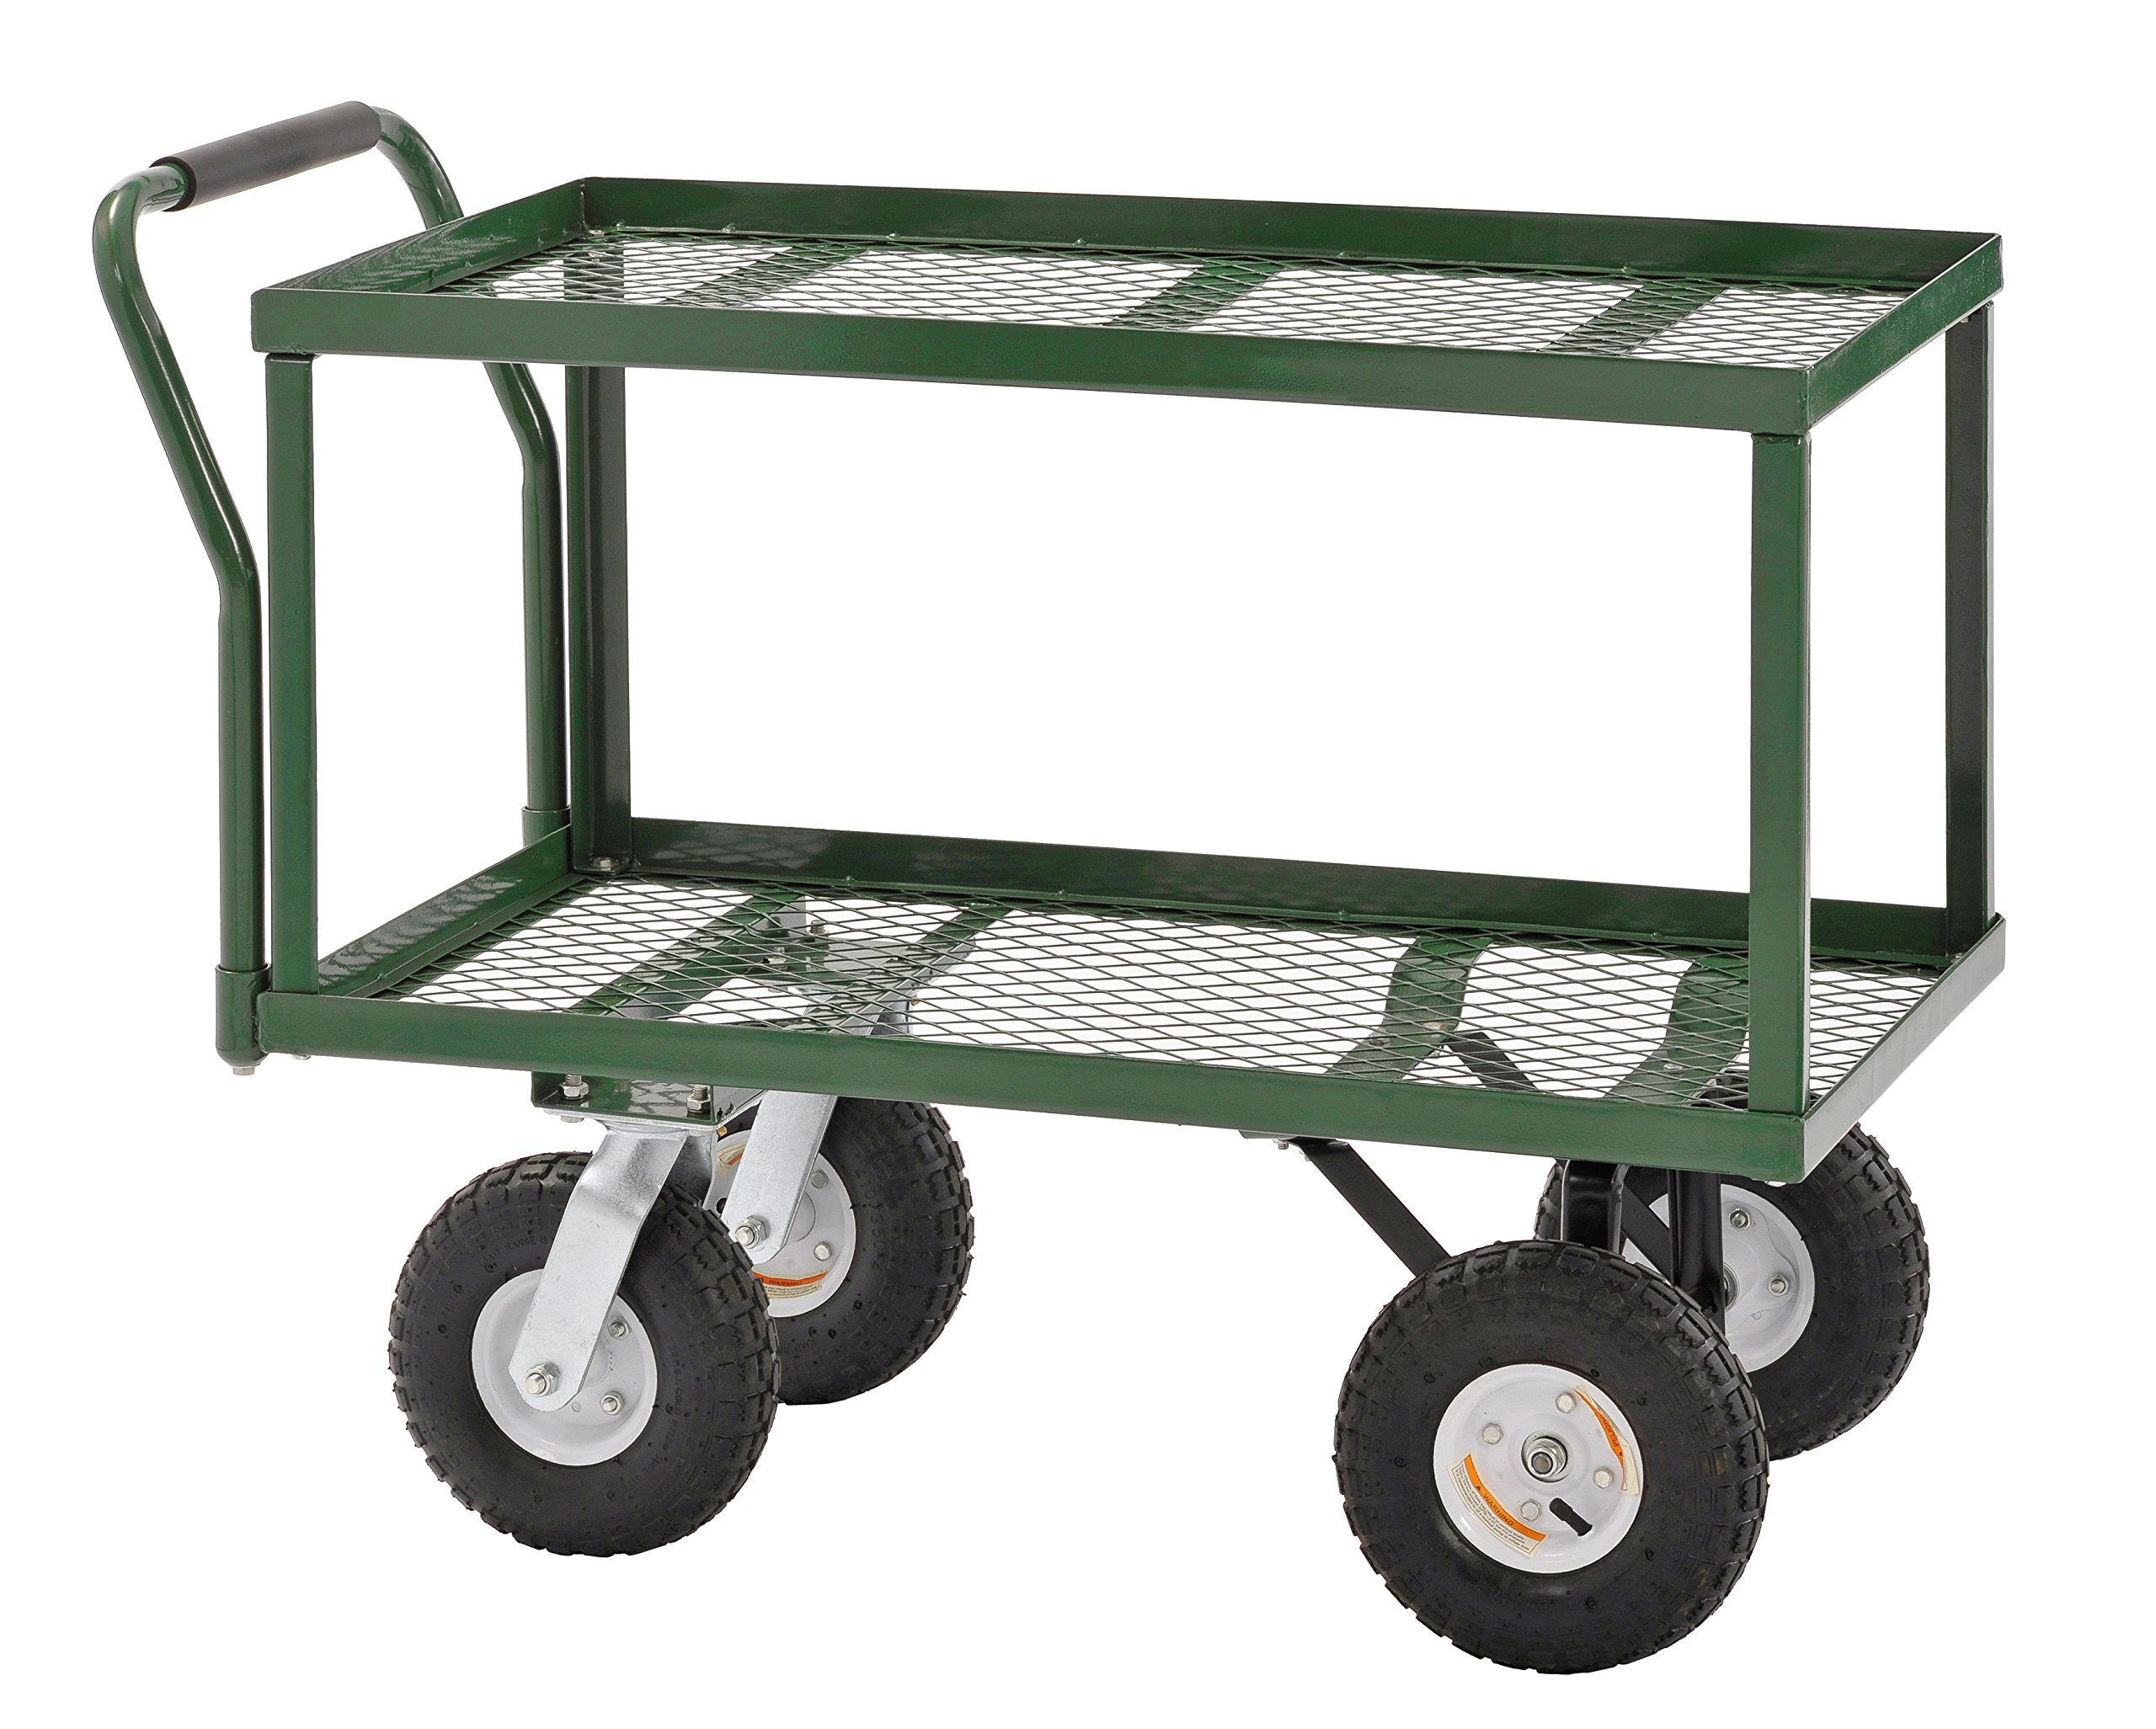 Sandusky TW3820 Green Heavy Duty Steel 2-Deck Flat Wagon, 550 lb. Capacity, 33'' Height x 38'' Length x 20'' Width